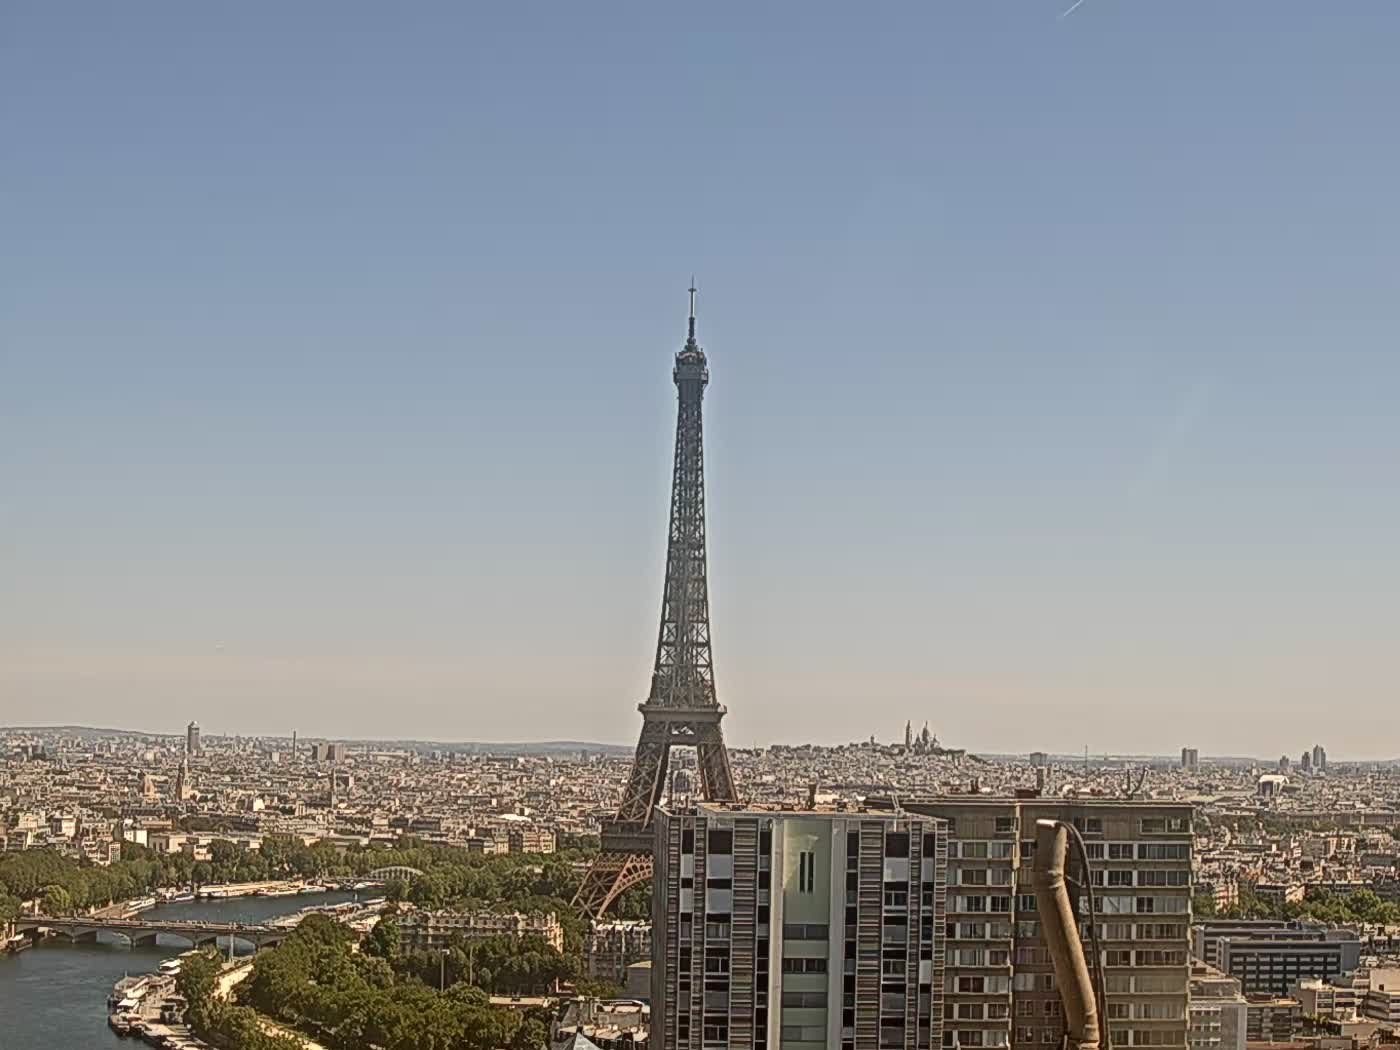 Paris Thu. 12:22